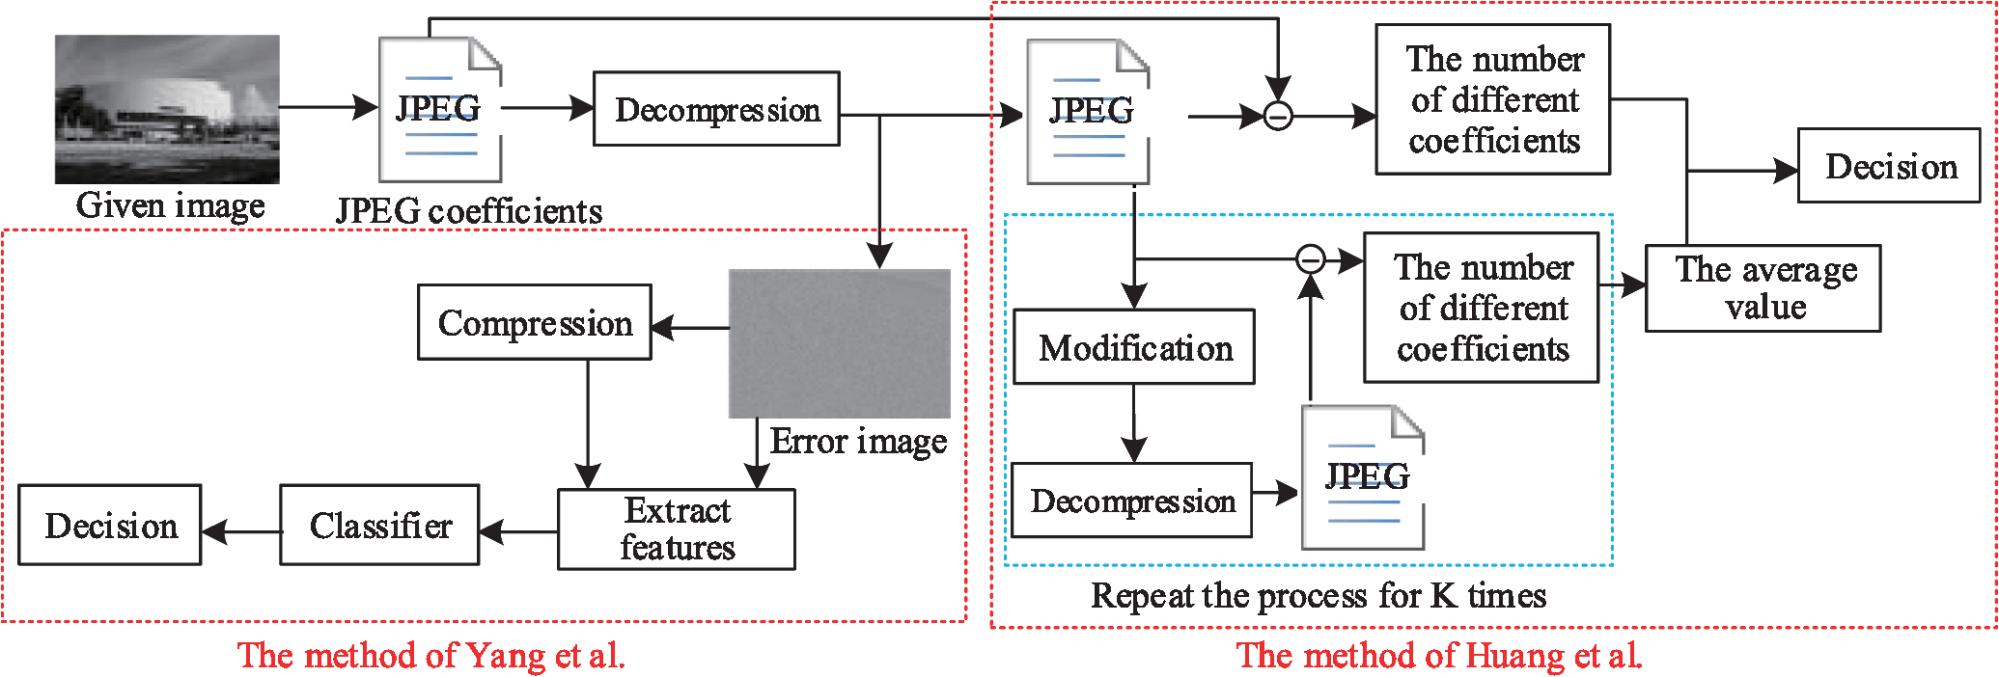 hight resolution of the detection schemes of huang et al and yang et al